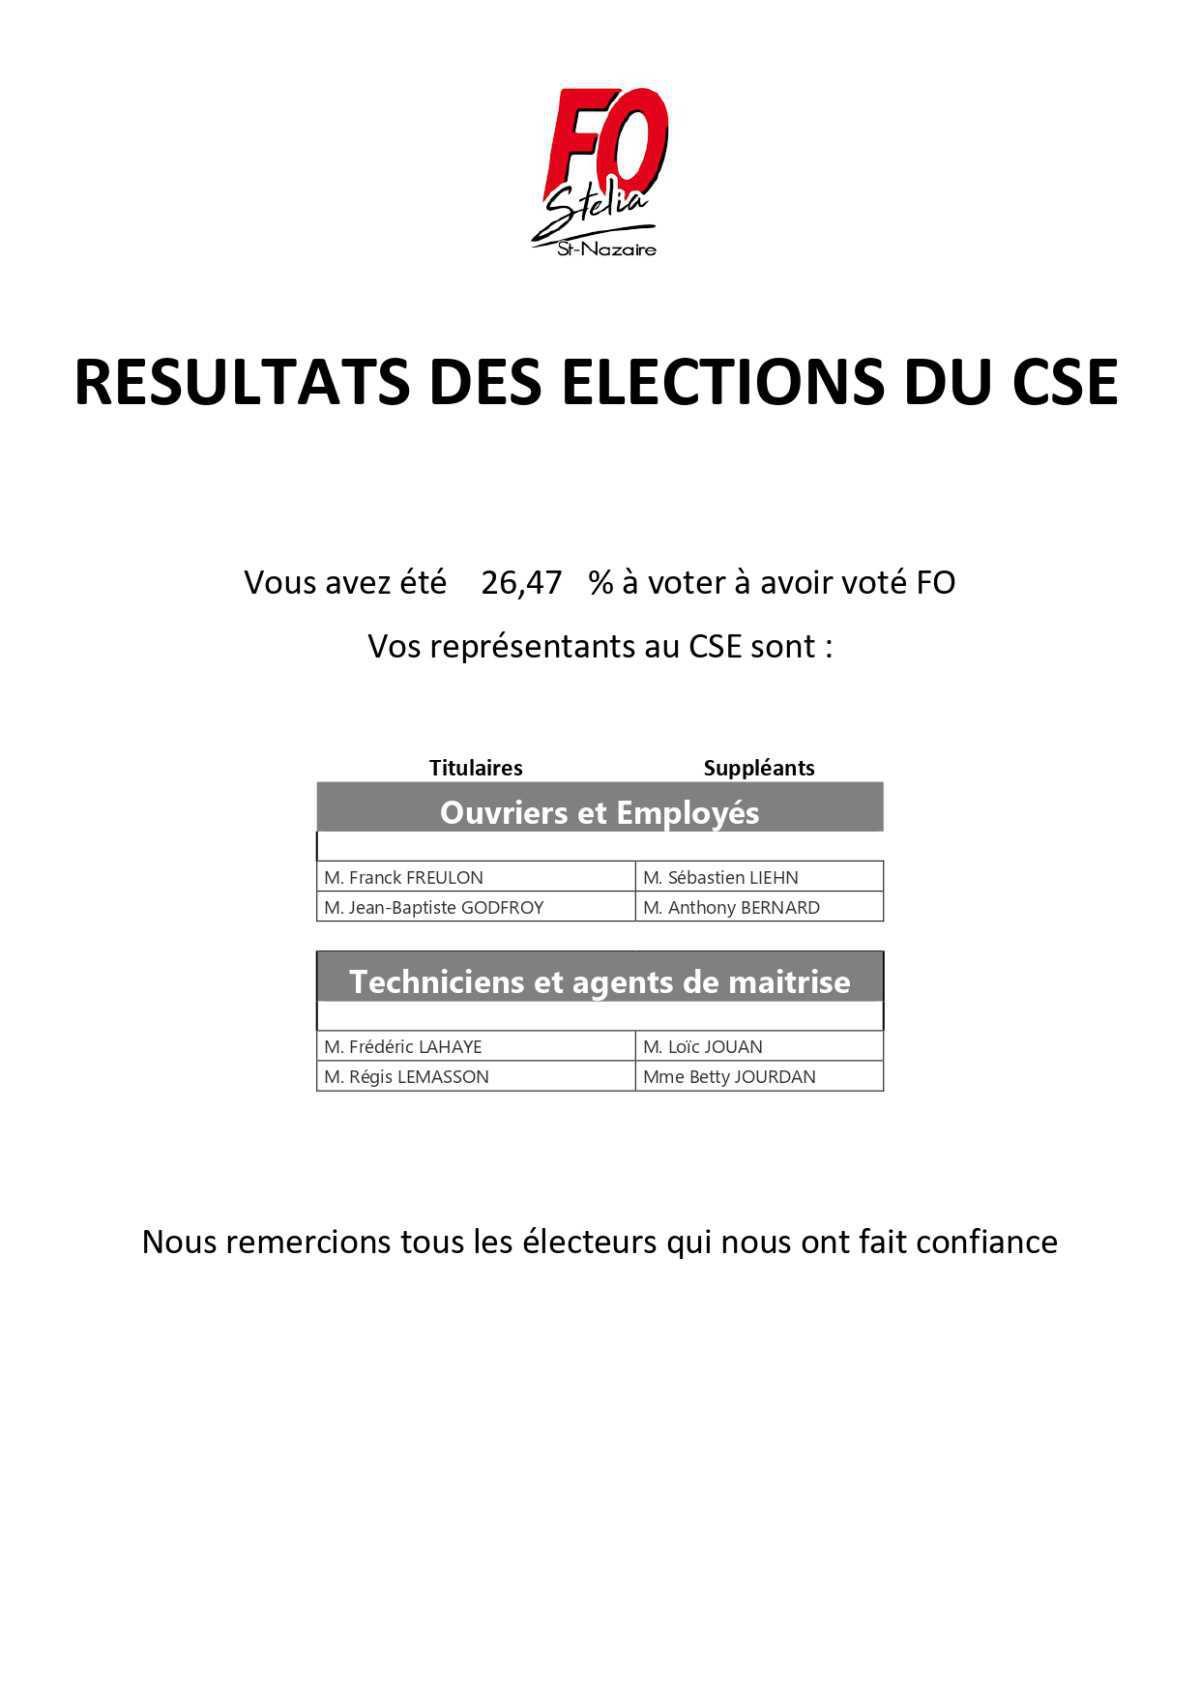 RESULTATS DES ELECTIONS DU CSE